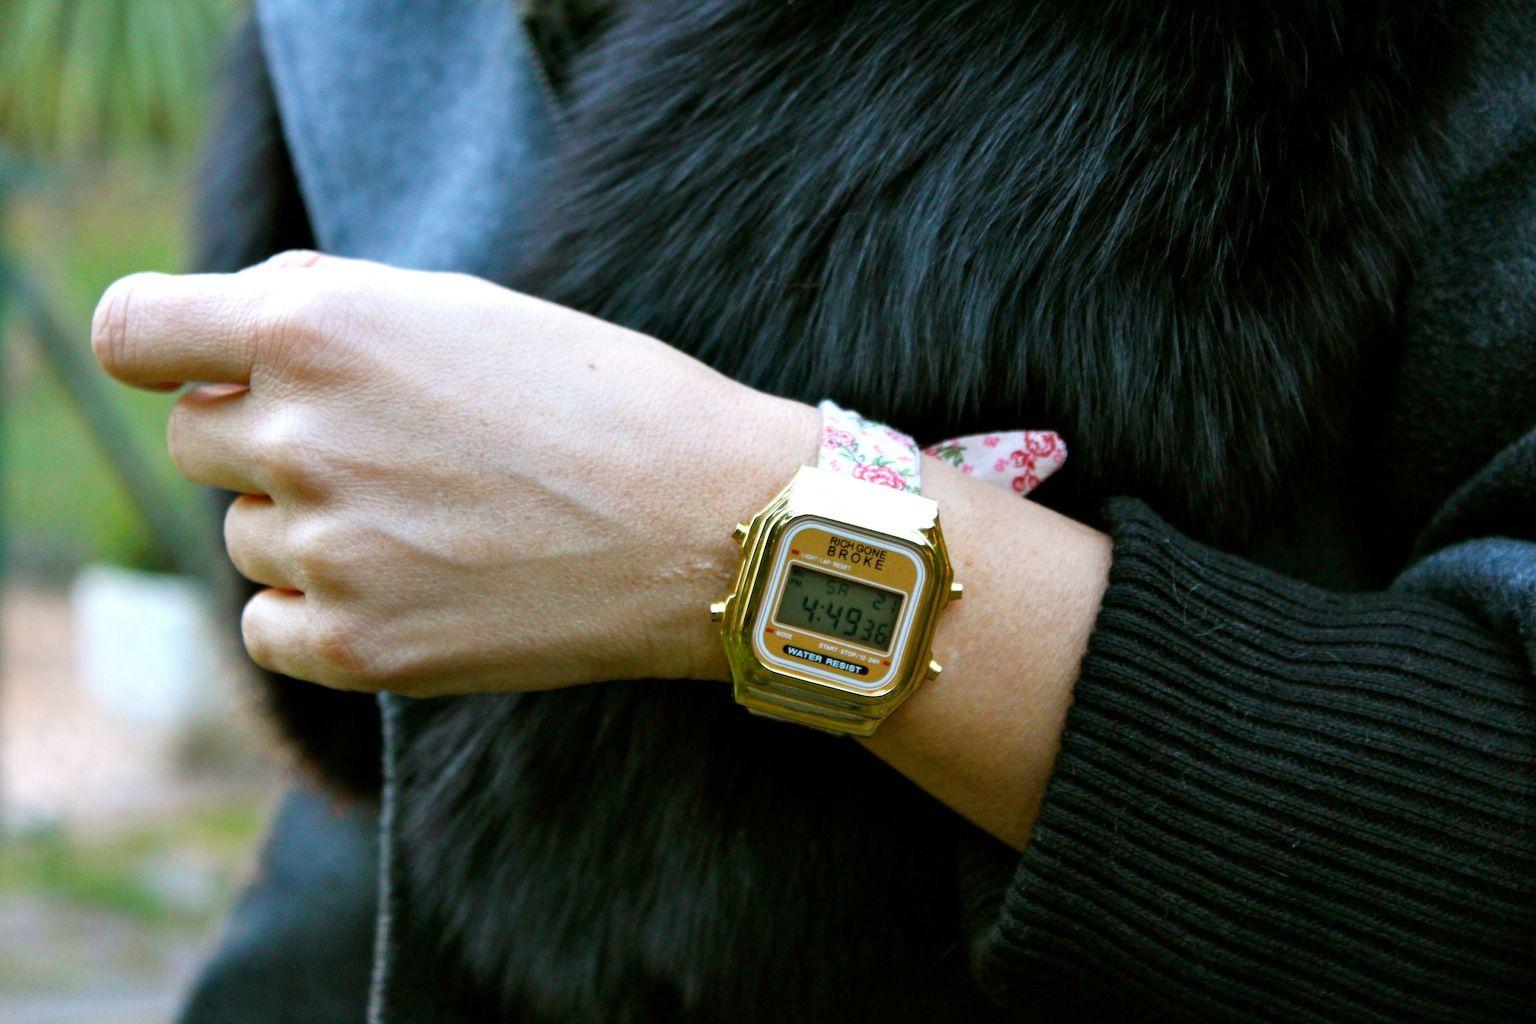 Fashion and Style Blog / Blog de Moda . Post: Mi Look / My Look .More pictures on/ Más fotos en : http://www.ohmylooks.com/?p=25841 .Llevo/I wear: Coat / Abrigo : Sheinside ; Watch / Reloj : Rich Gone Broke (via Arte Móvil Joyeros) ; Jeans : Hollister ; Bag / Bolso : Louis Vuitton ; Ring / Anillo : Coolook ; Boots / Botas : Pilar Burgos.